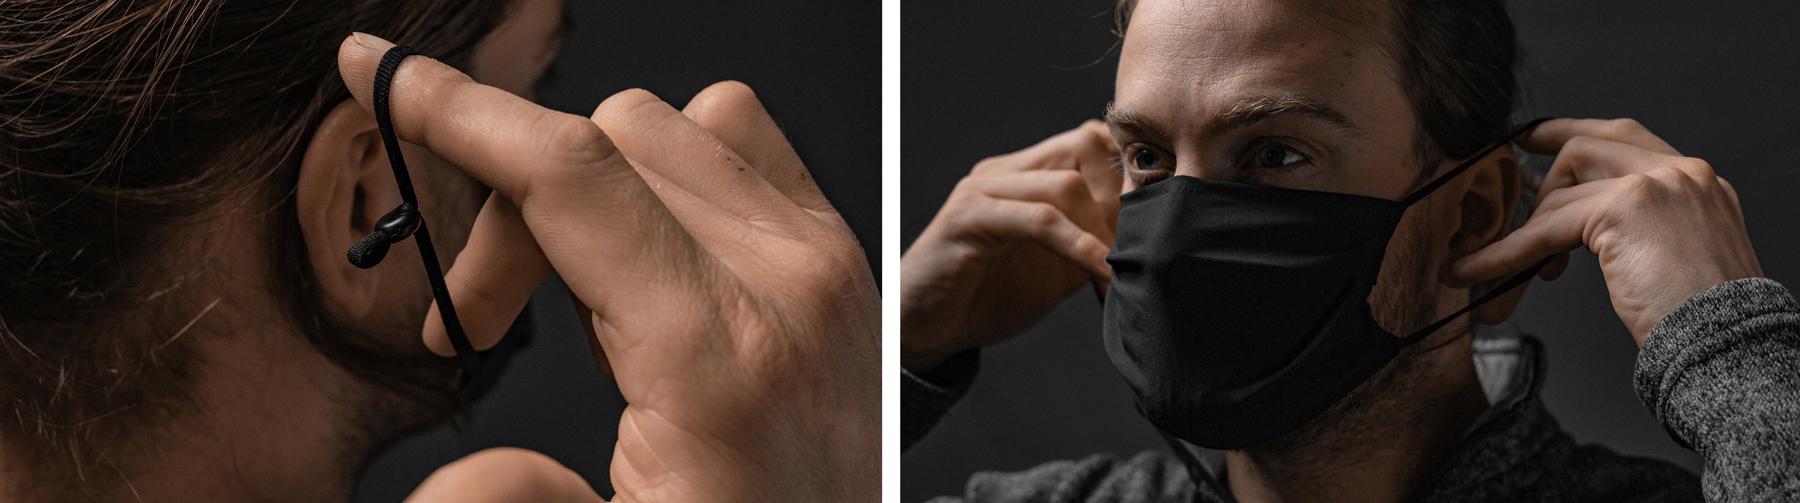 matador-keychainmask-adjust.jpg